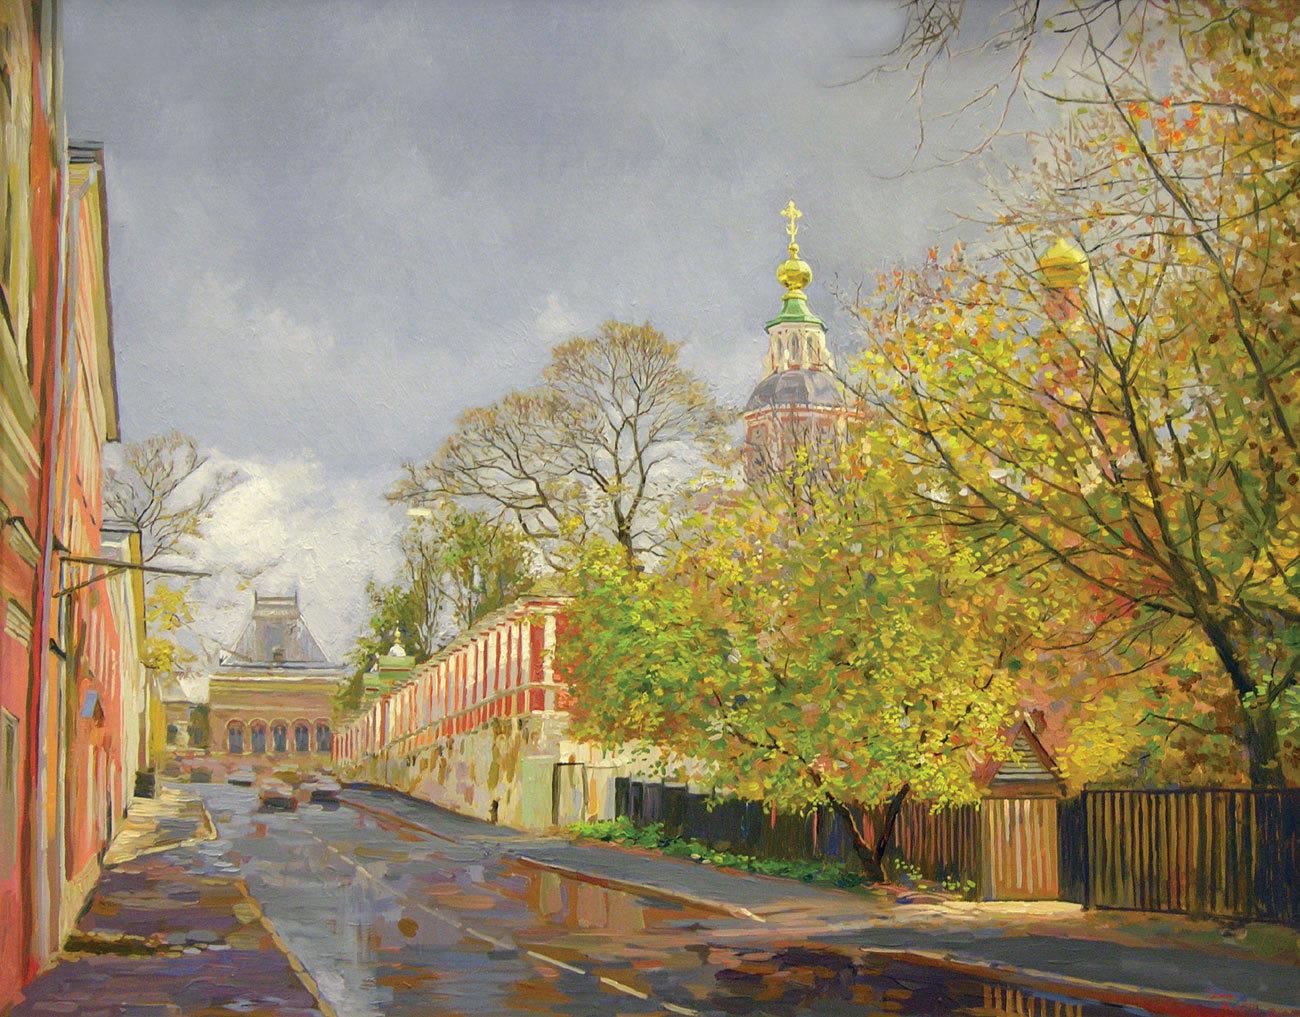 Yakimanskii lane. Church of St. John the Warrior. Moscow. Autumn. 2004. Oil on canvas. 55 x 75 cm.